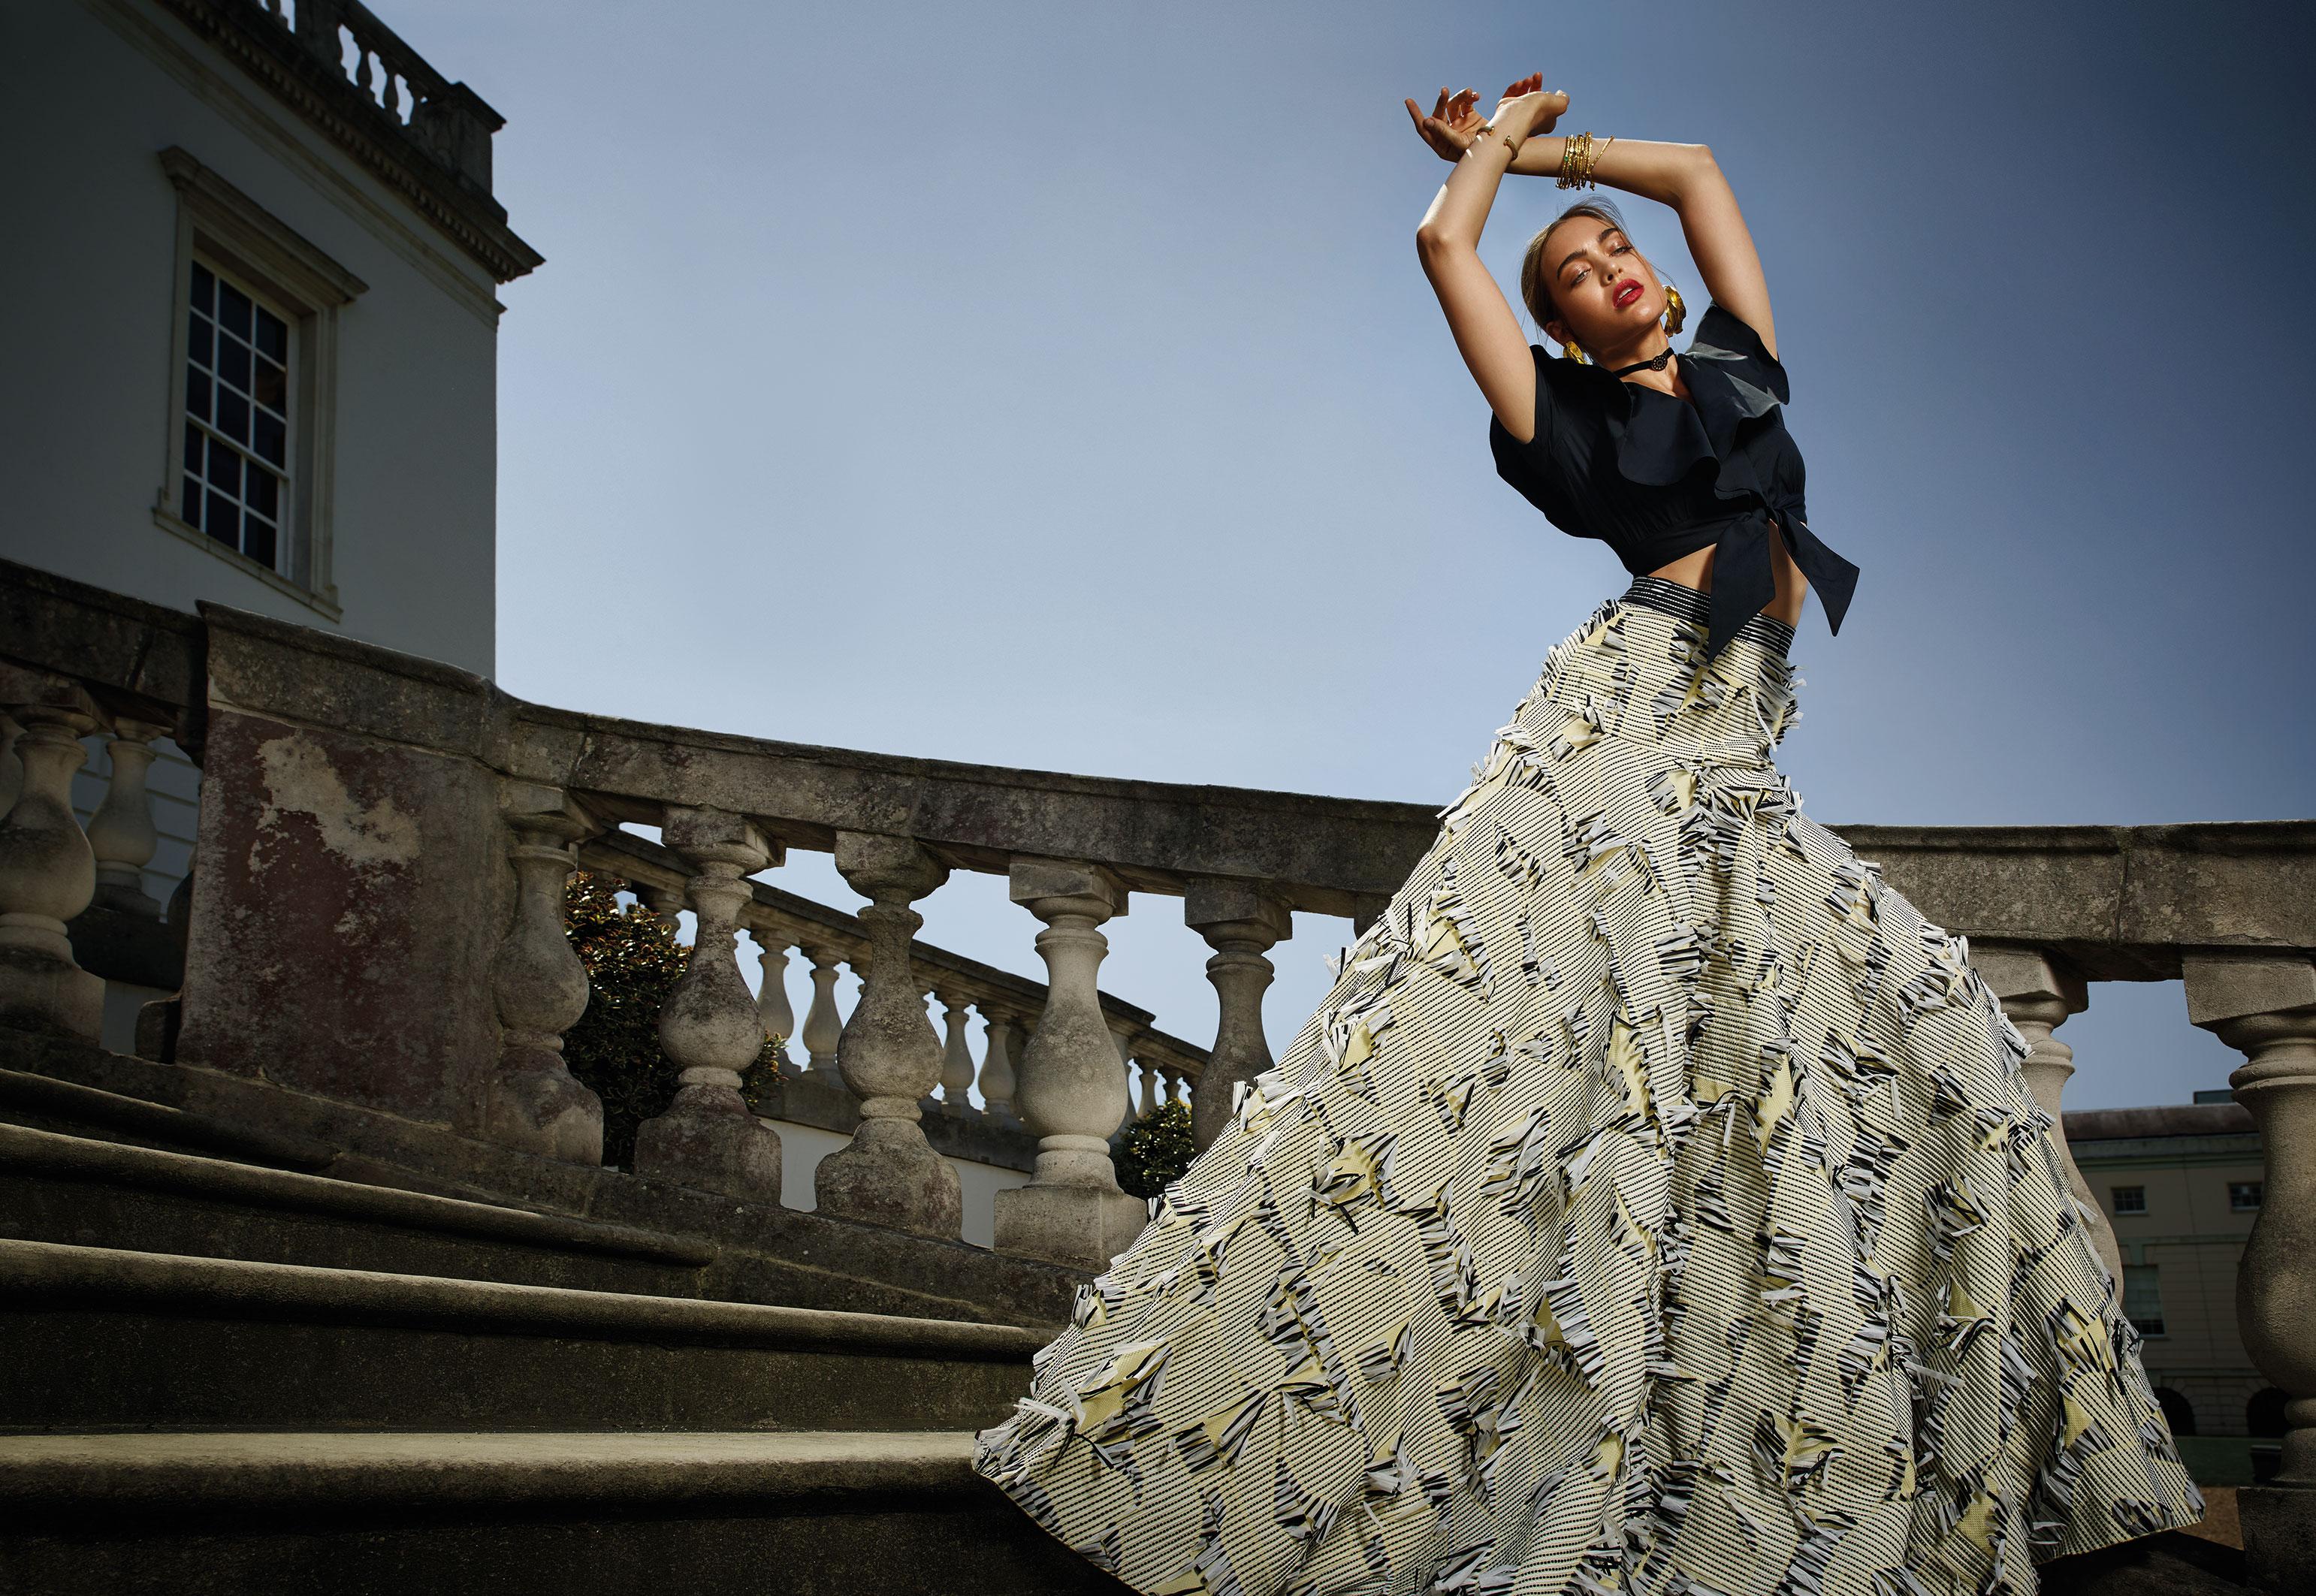 1_160606_AM_Flamenco_Shot2_271283